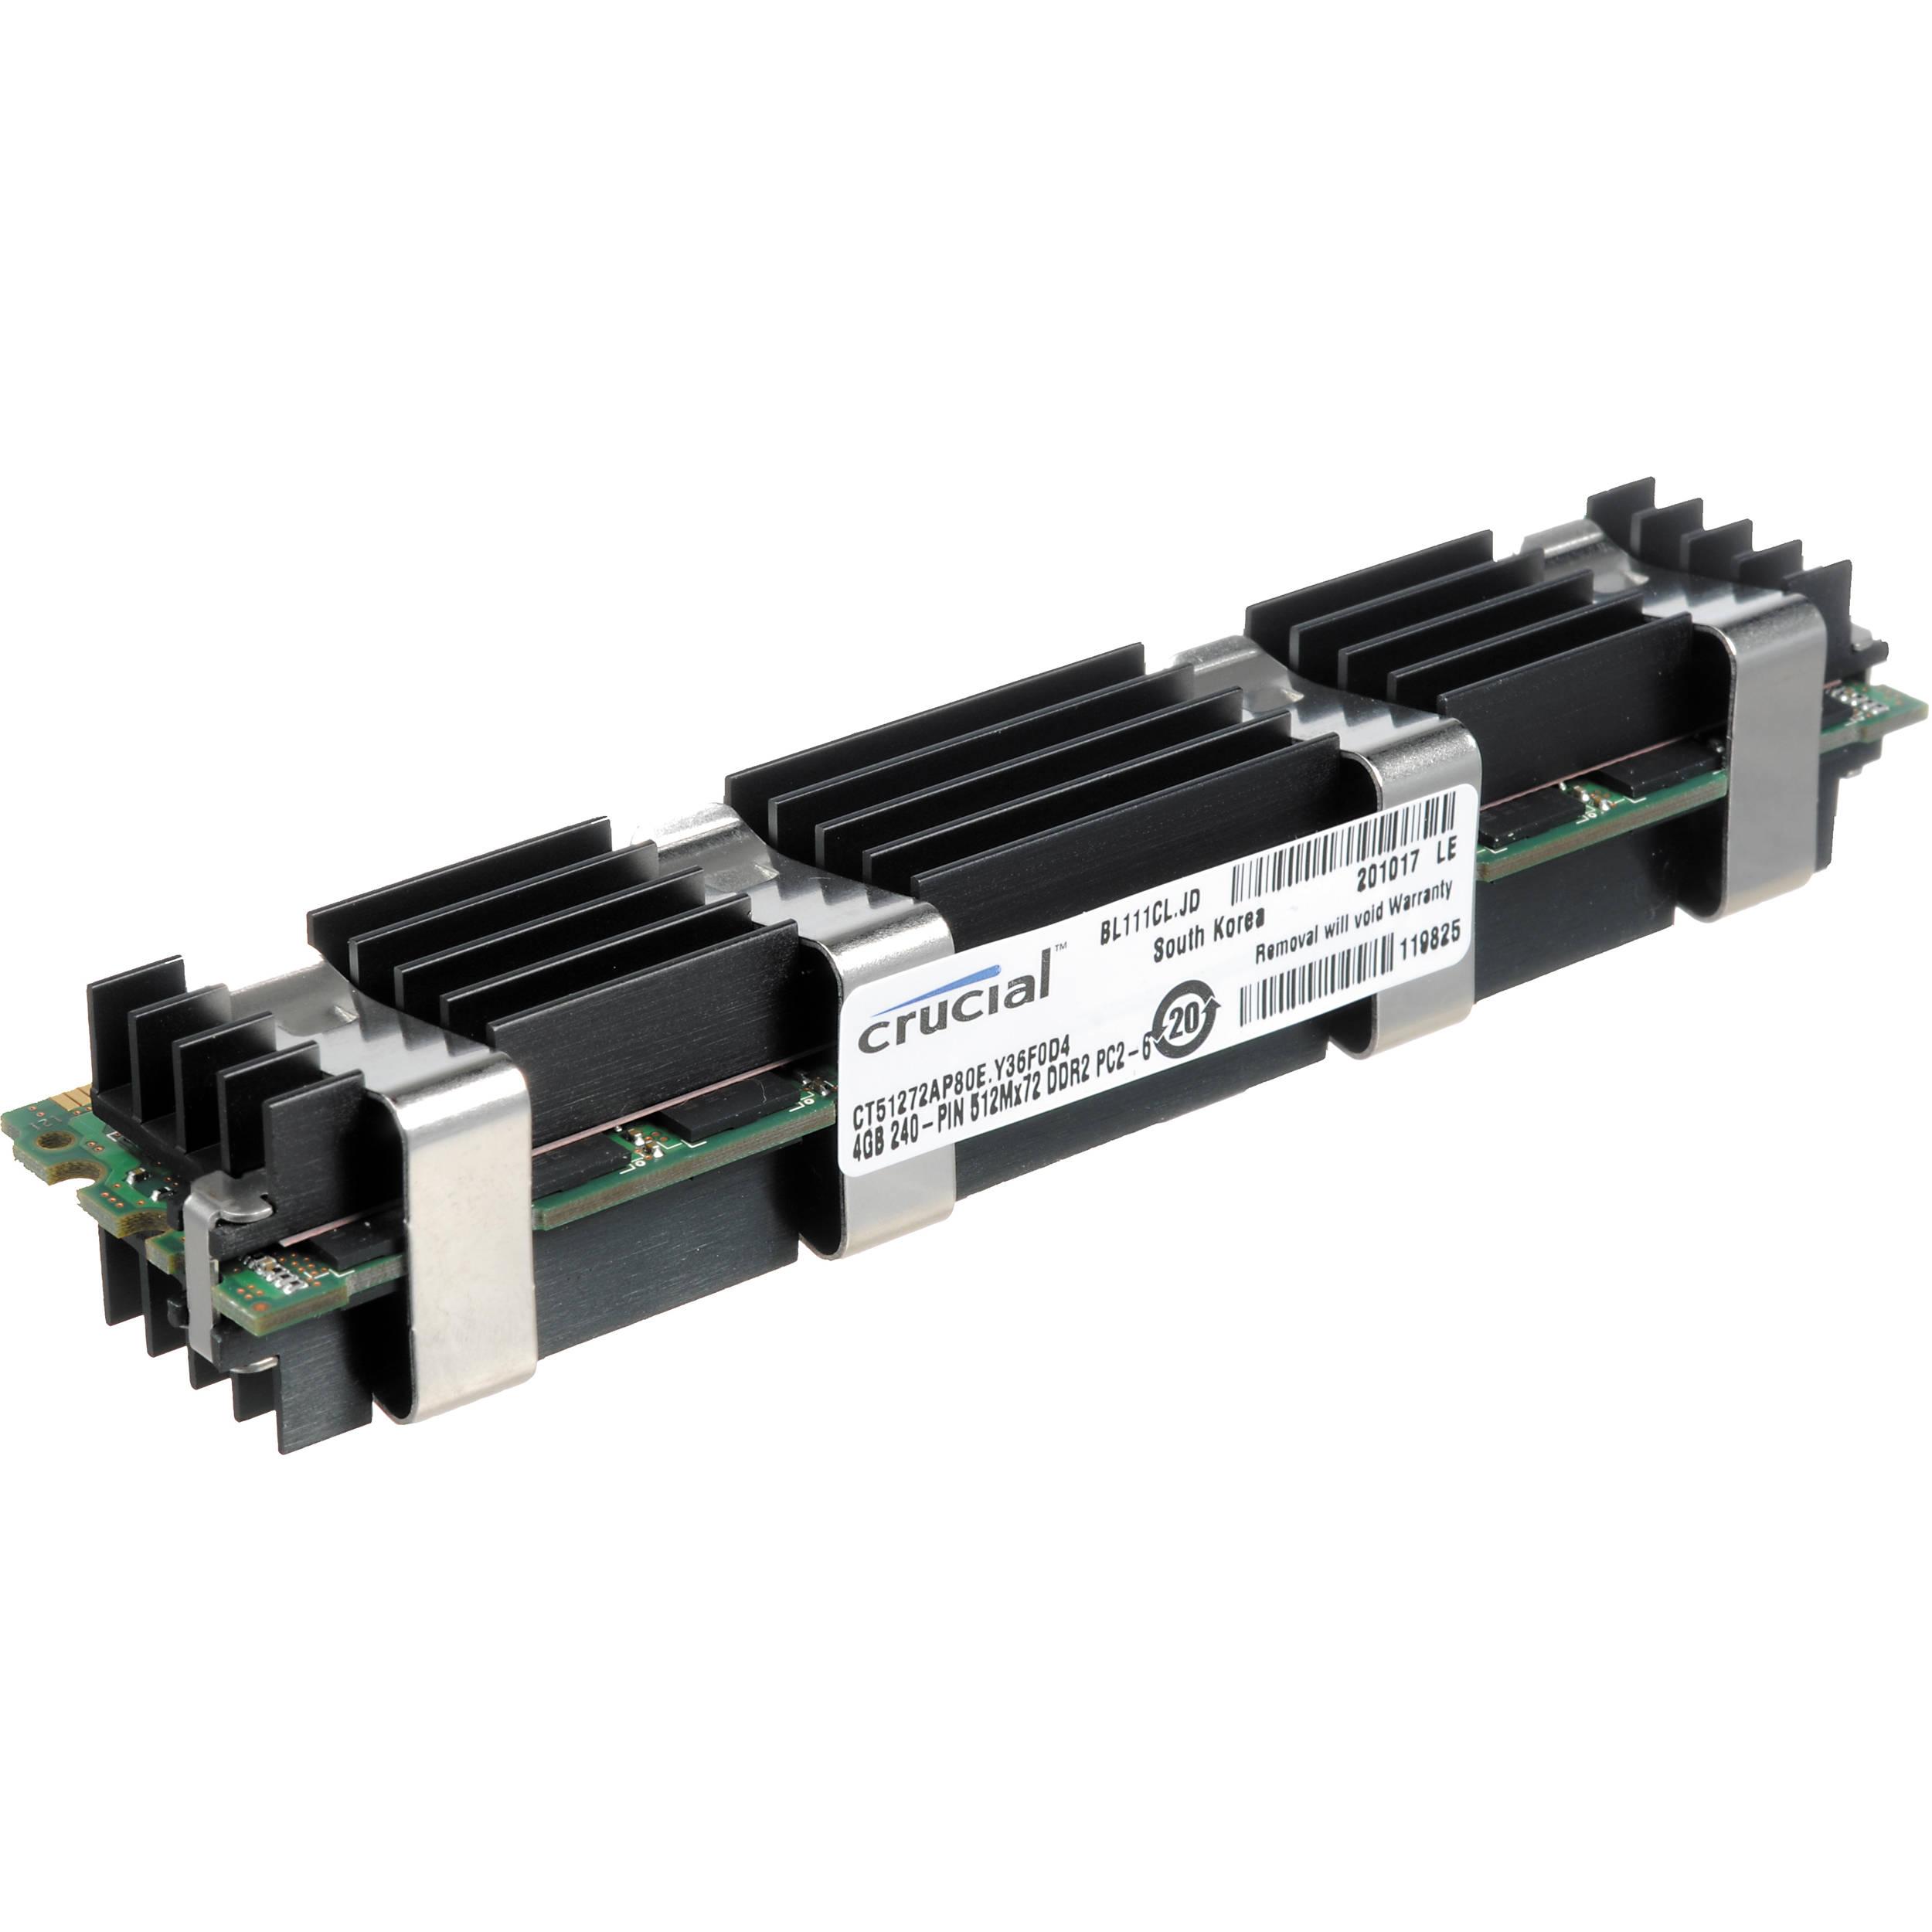 Crucial 4GB FB DIMM Memory For Mac Pro